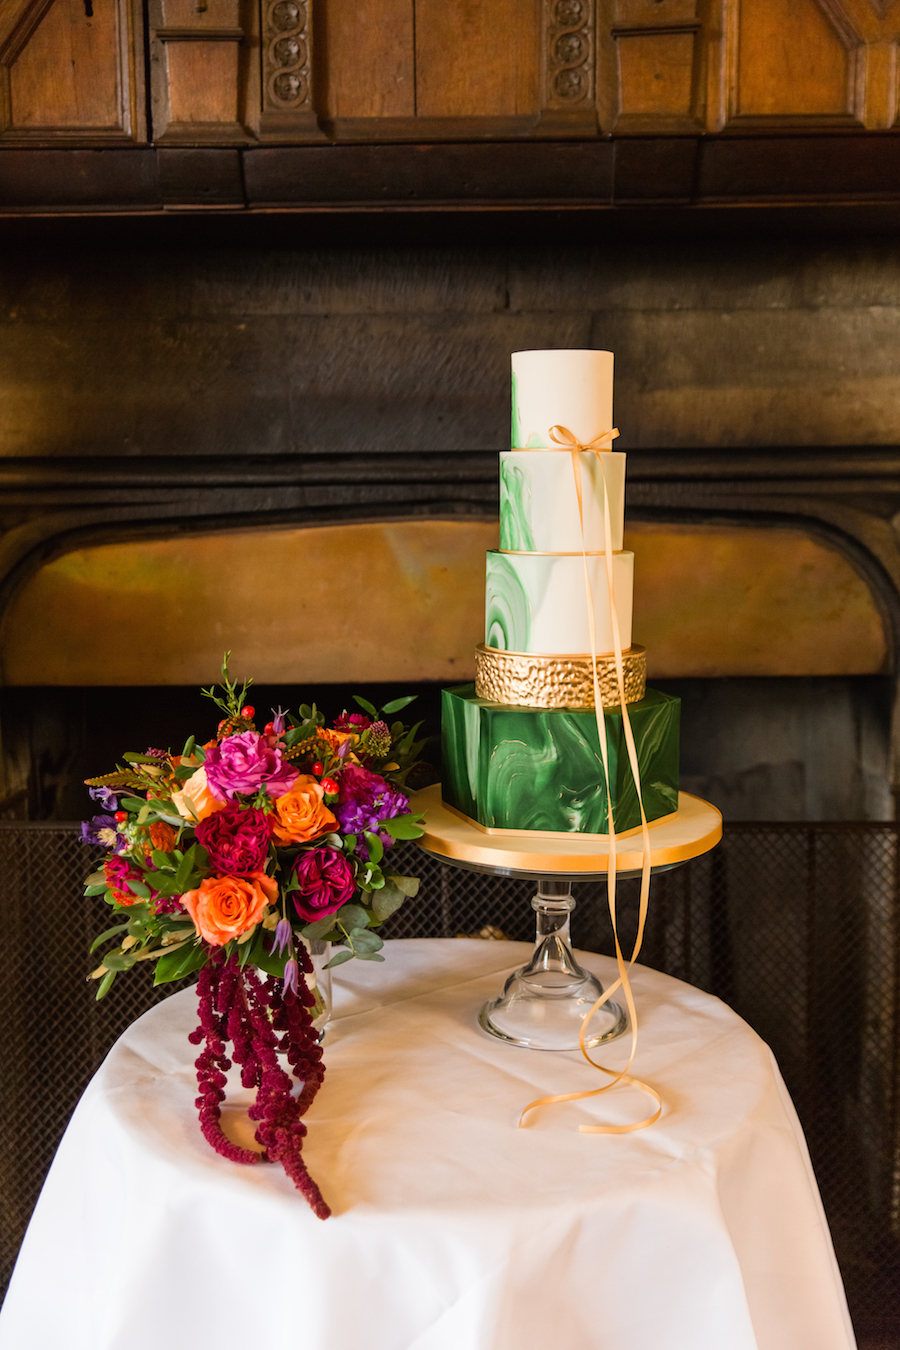 Jewel toned autumn wedding vibes from Layer Marney, image credit Ayshea Goldberg Photography (9)